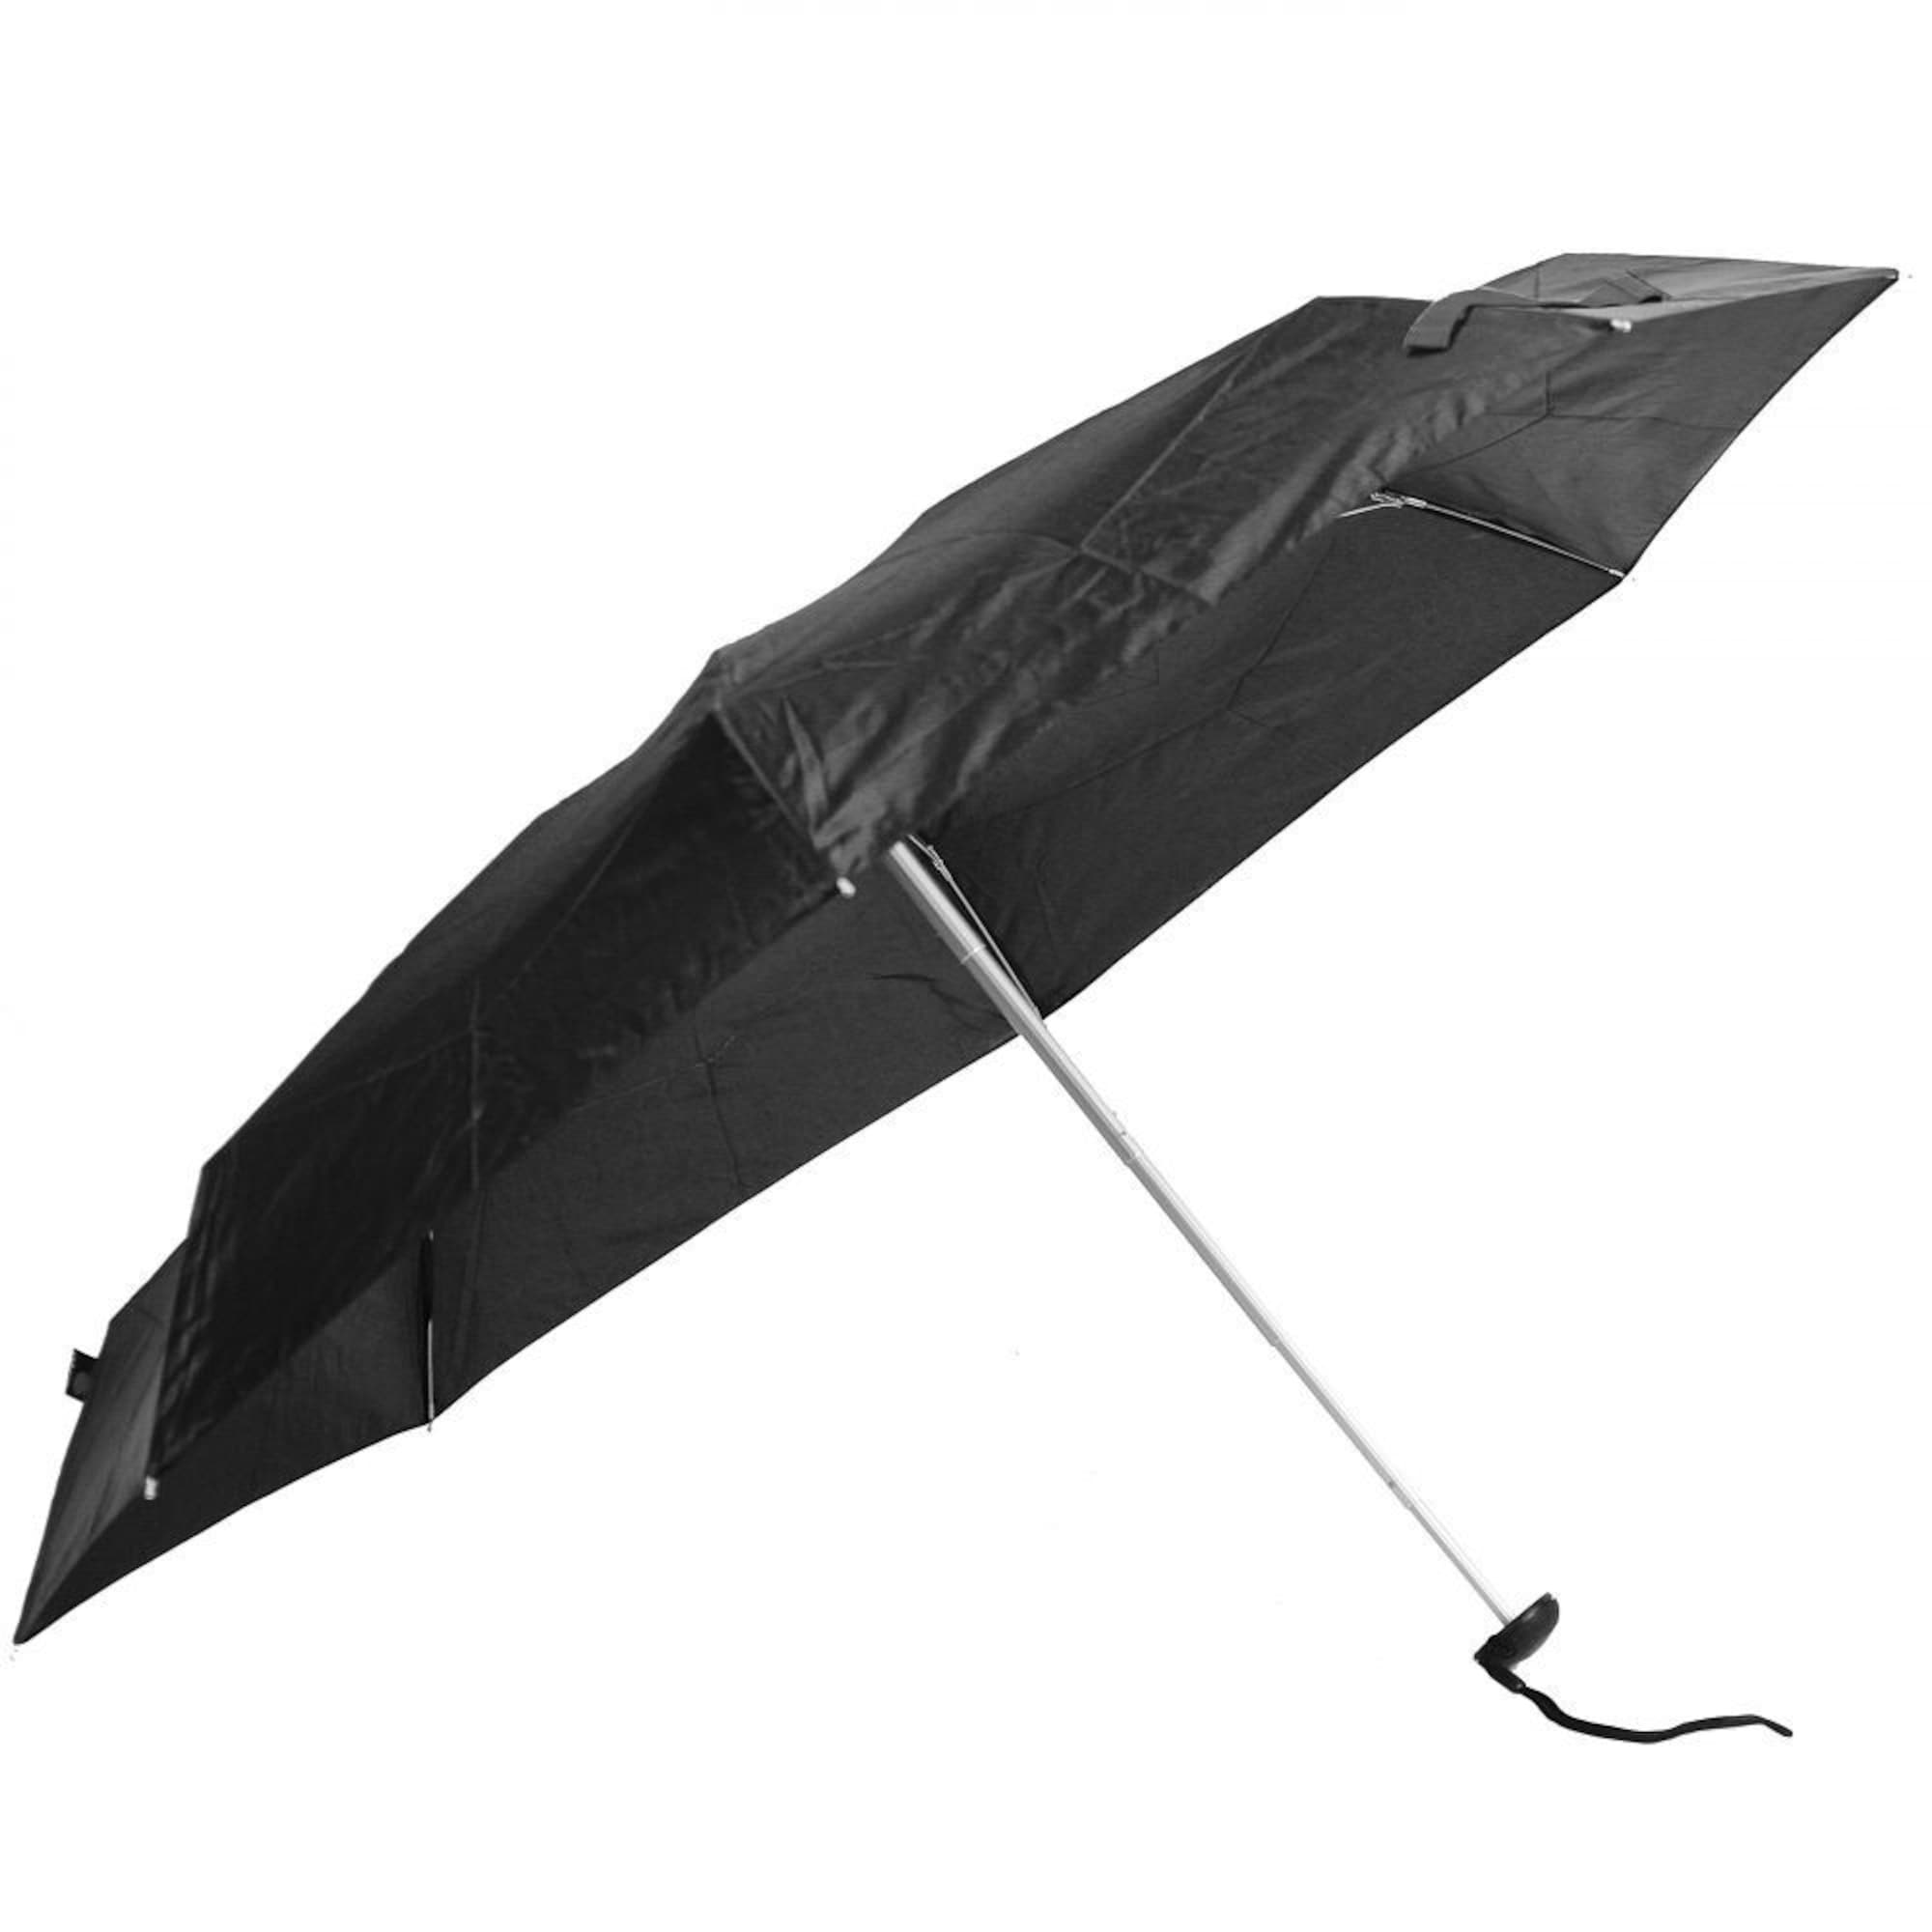 Taschenschirm 'Manual X1' | Accessoires > Regenschirme > Taschenschirme | knirps